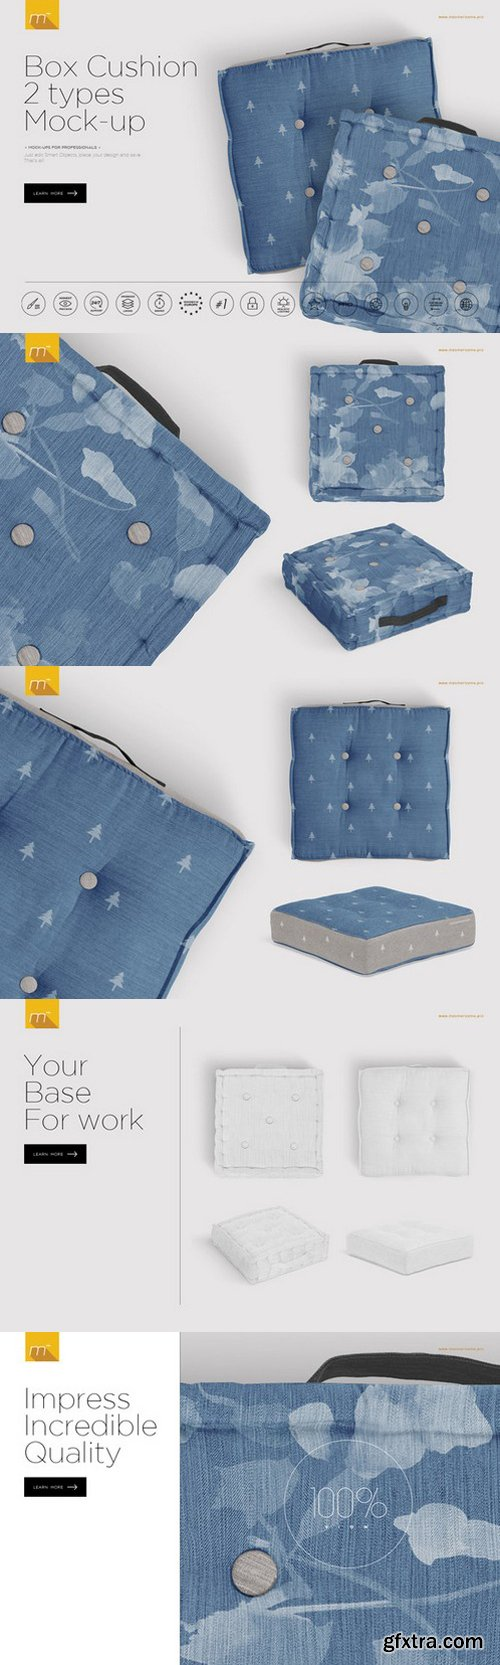 CM - Box Cushion 2 Types Mock-up 735369